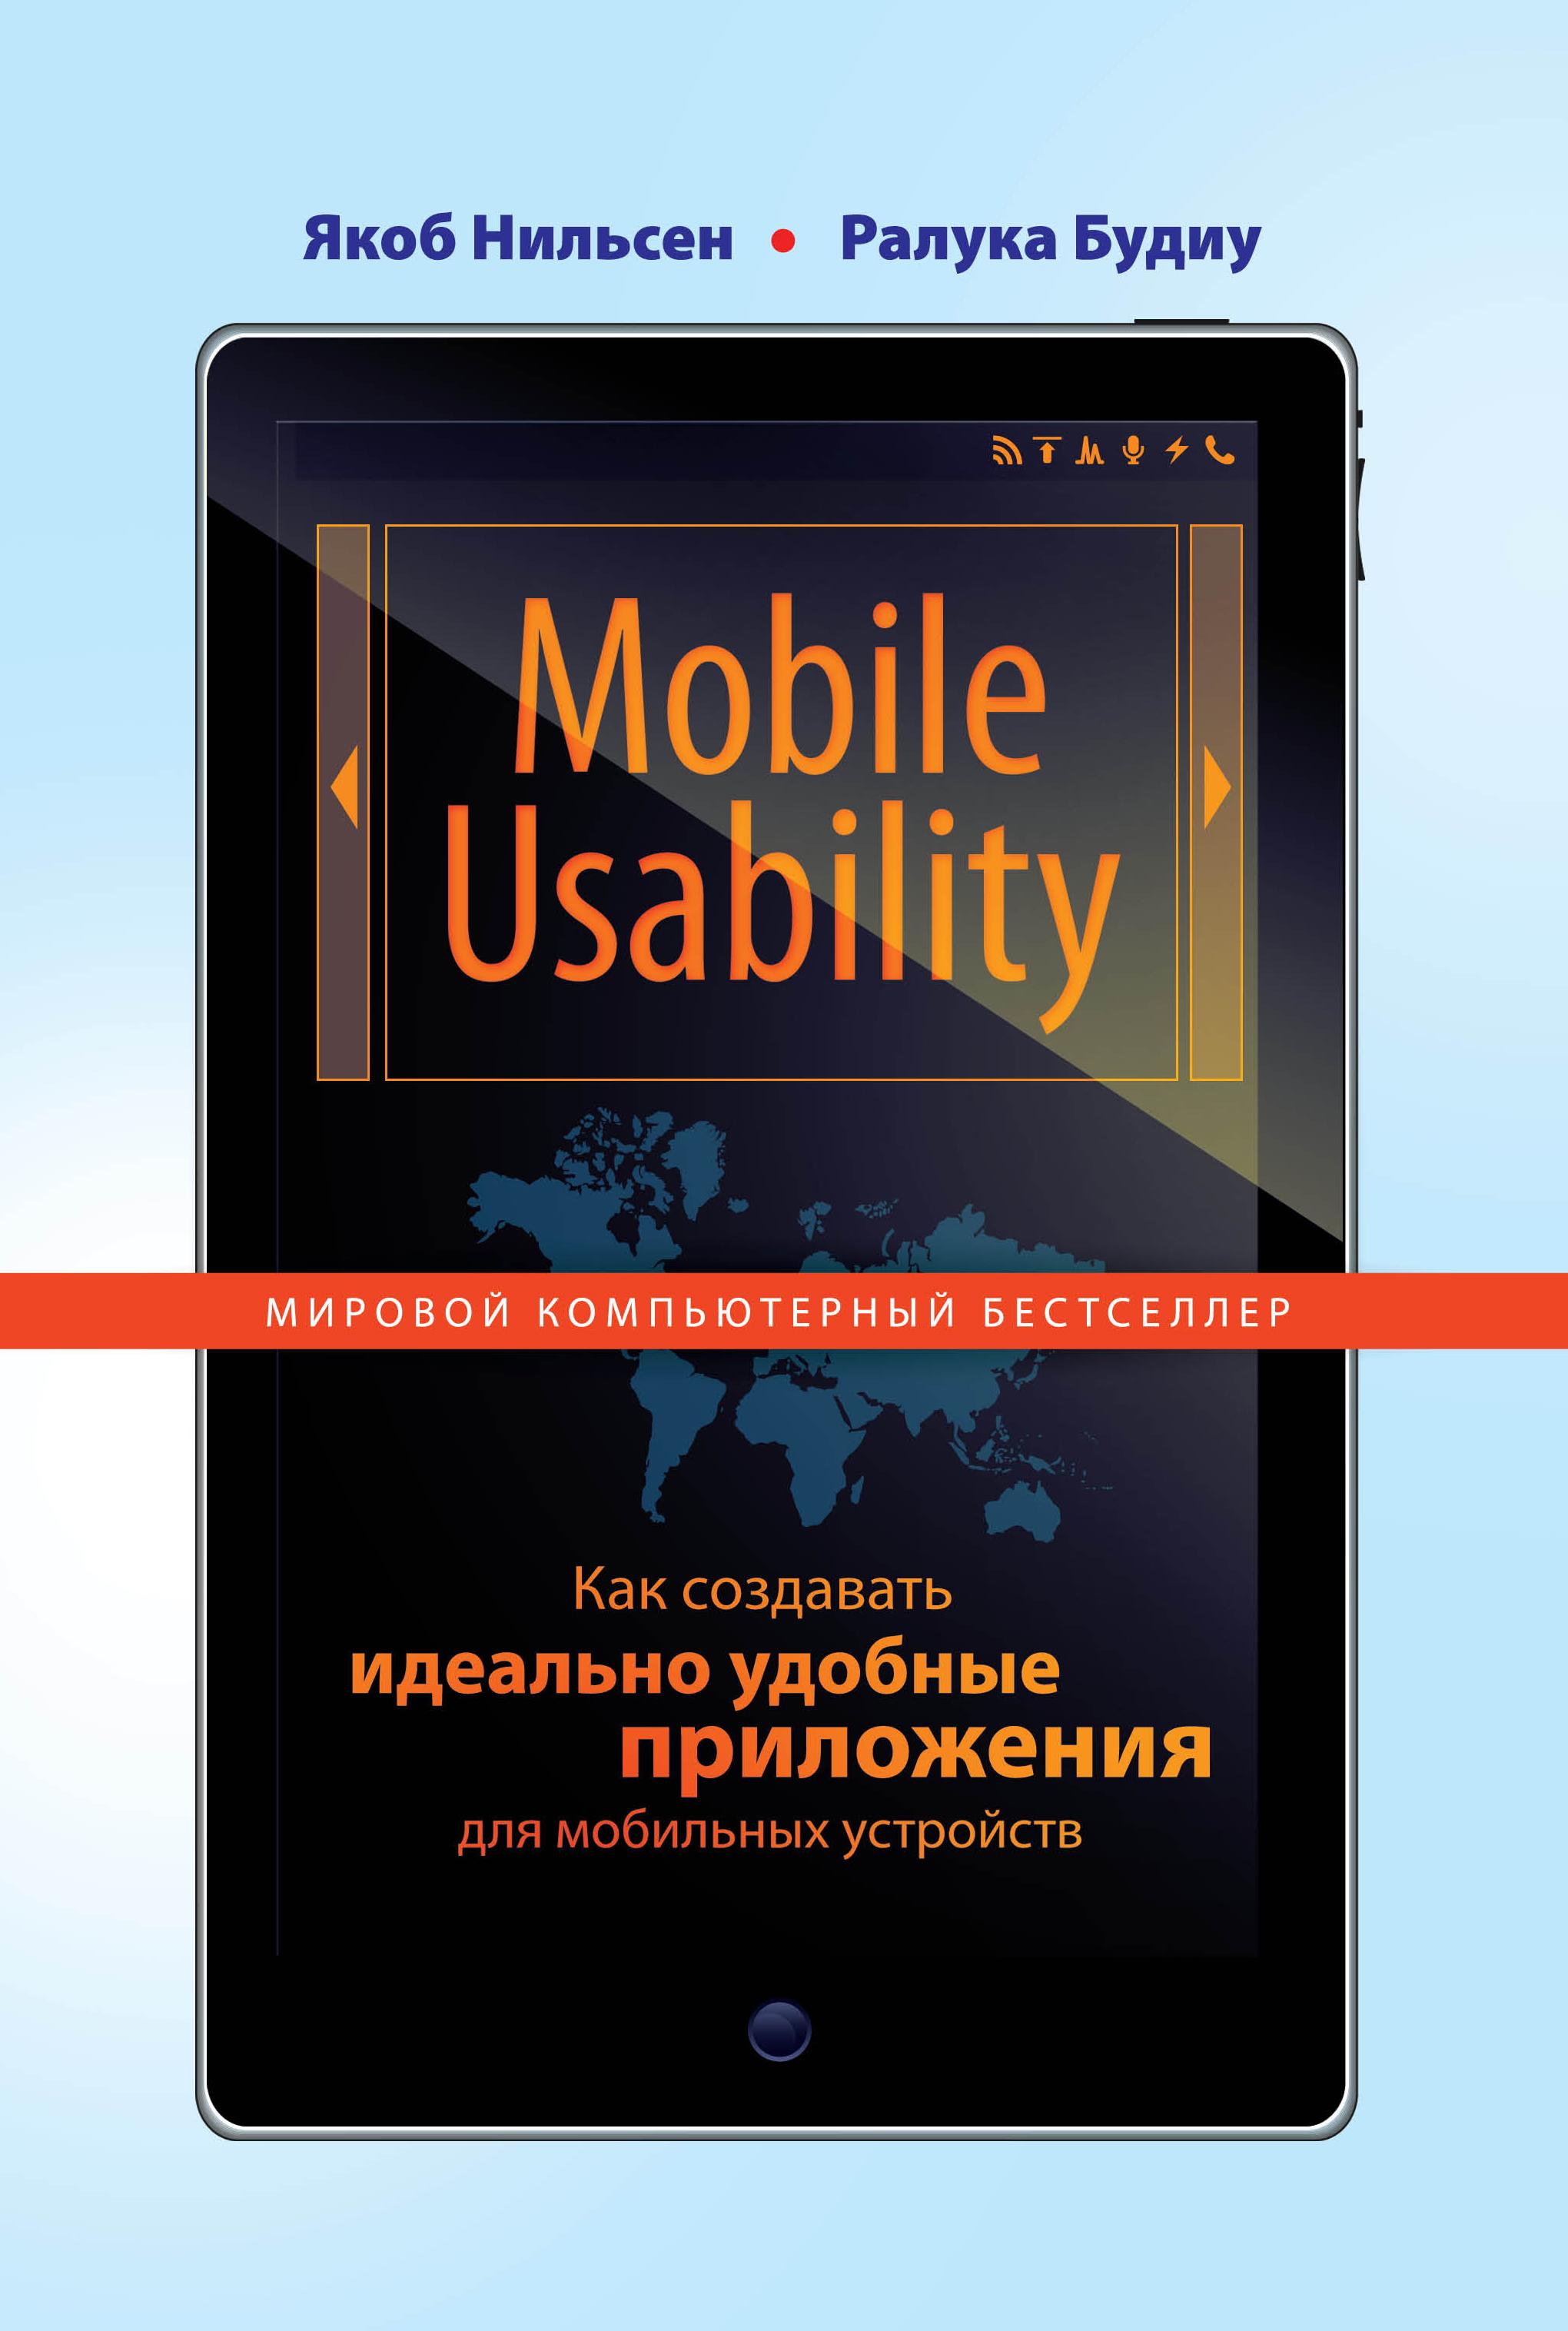 Mobile Usability. ��� ��������� �������� ������� ���������� ��� ��������� ���������